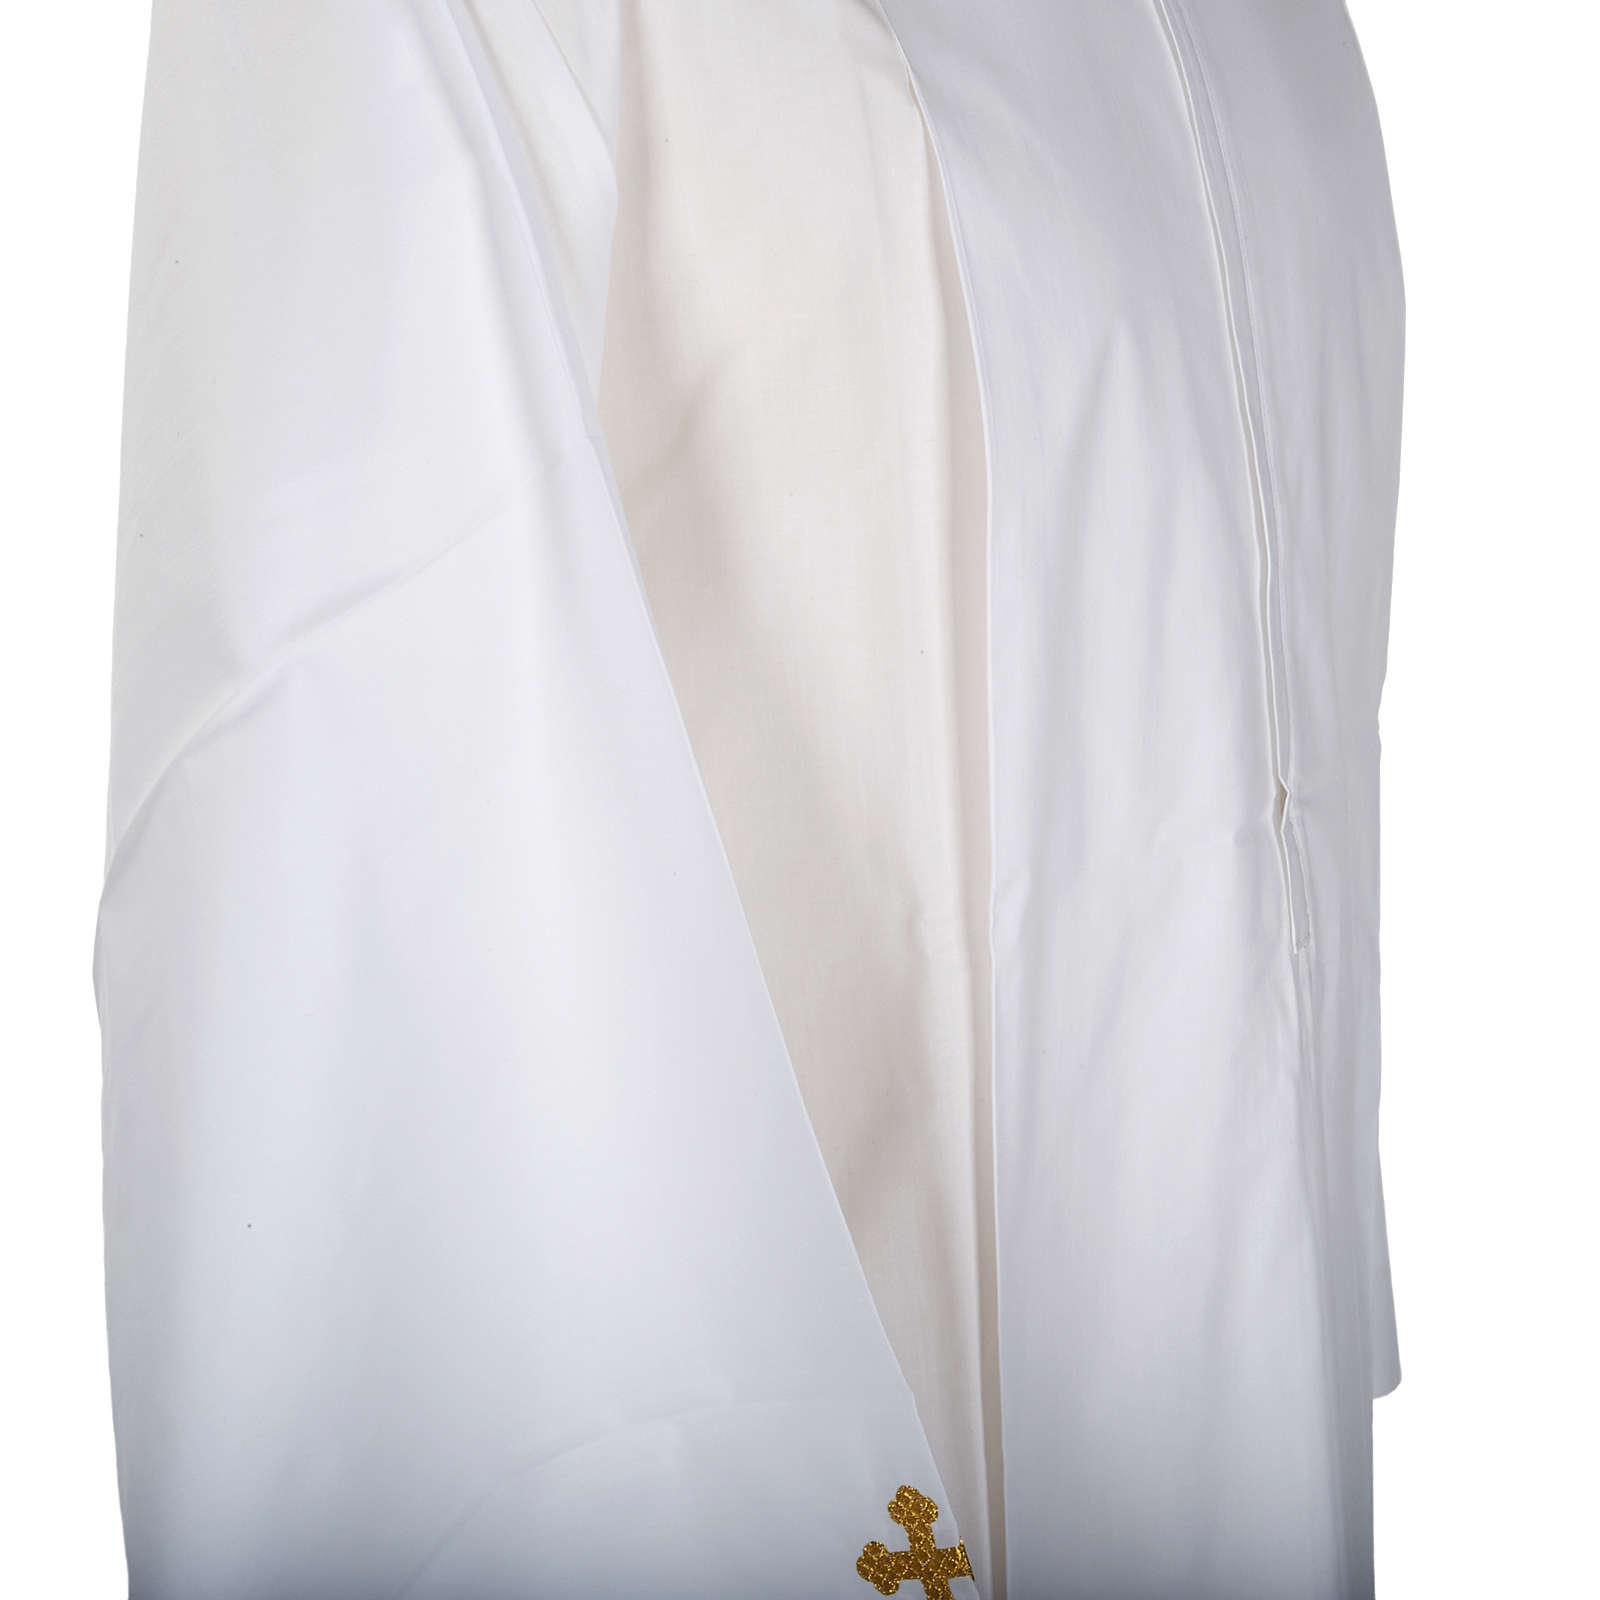 Camice bianco cotone croci decorate 4